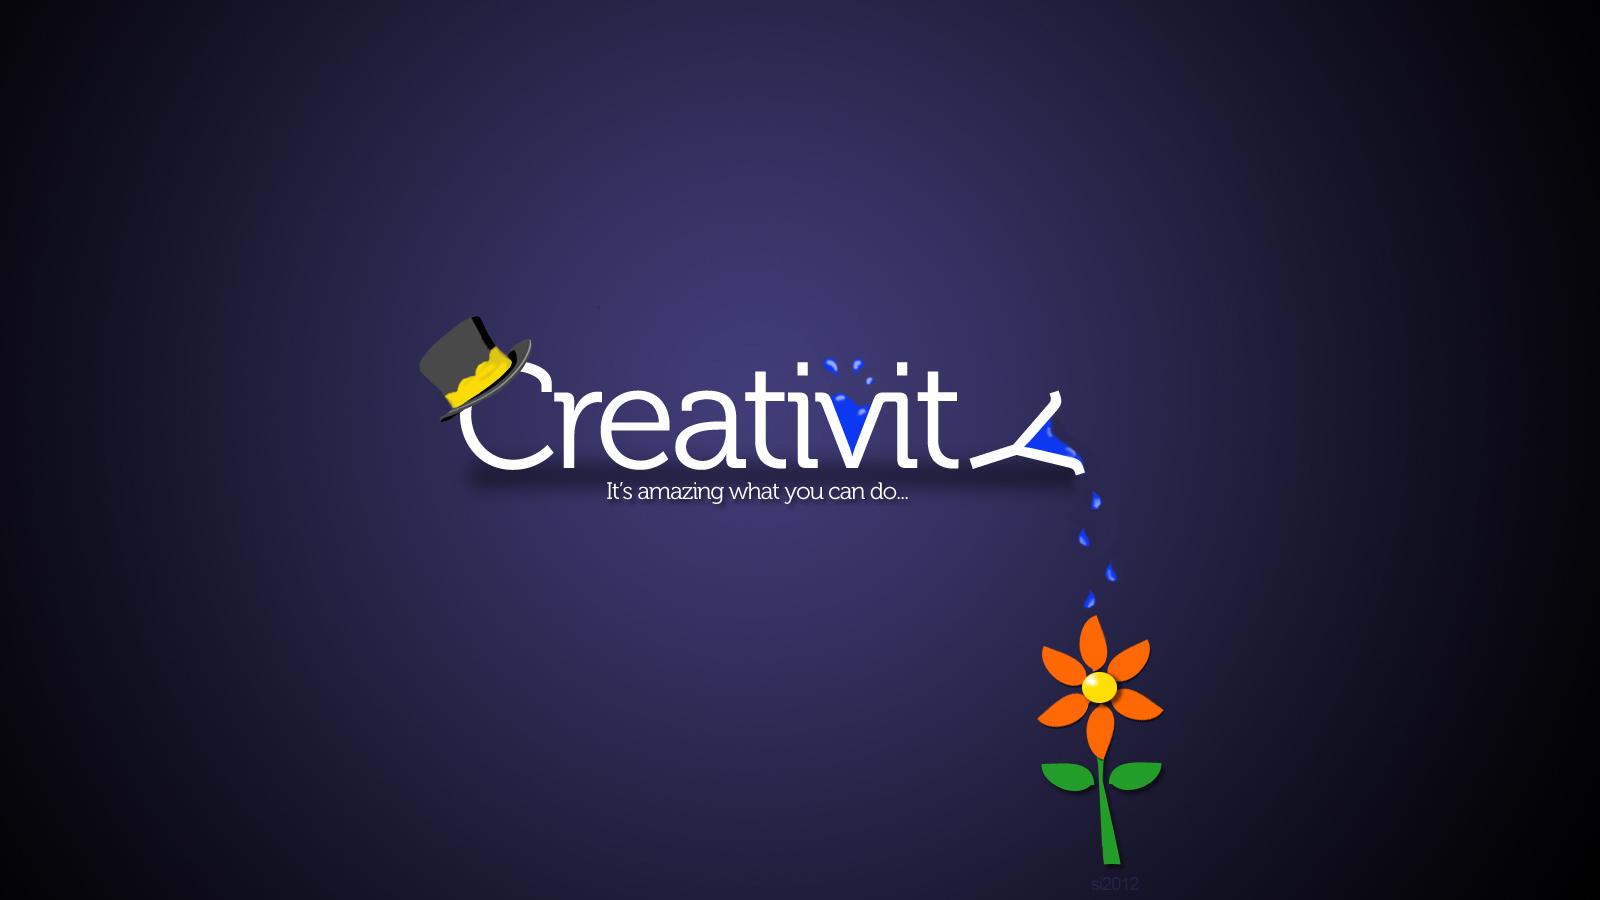 Creativity Desktop Wallpaper by PsPnSue on DeviantArt